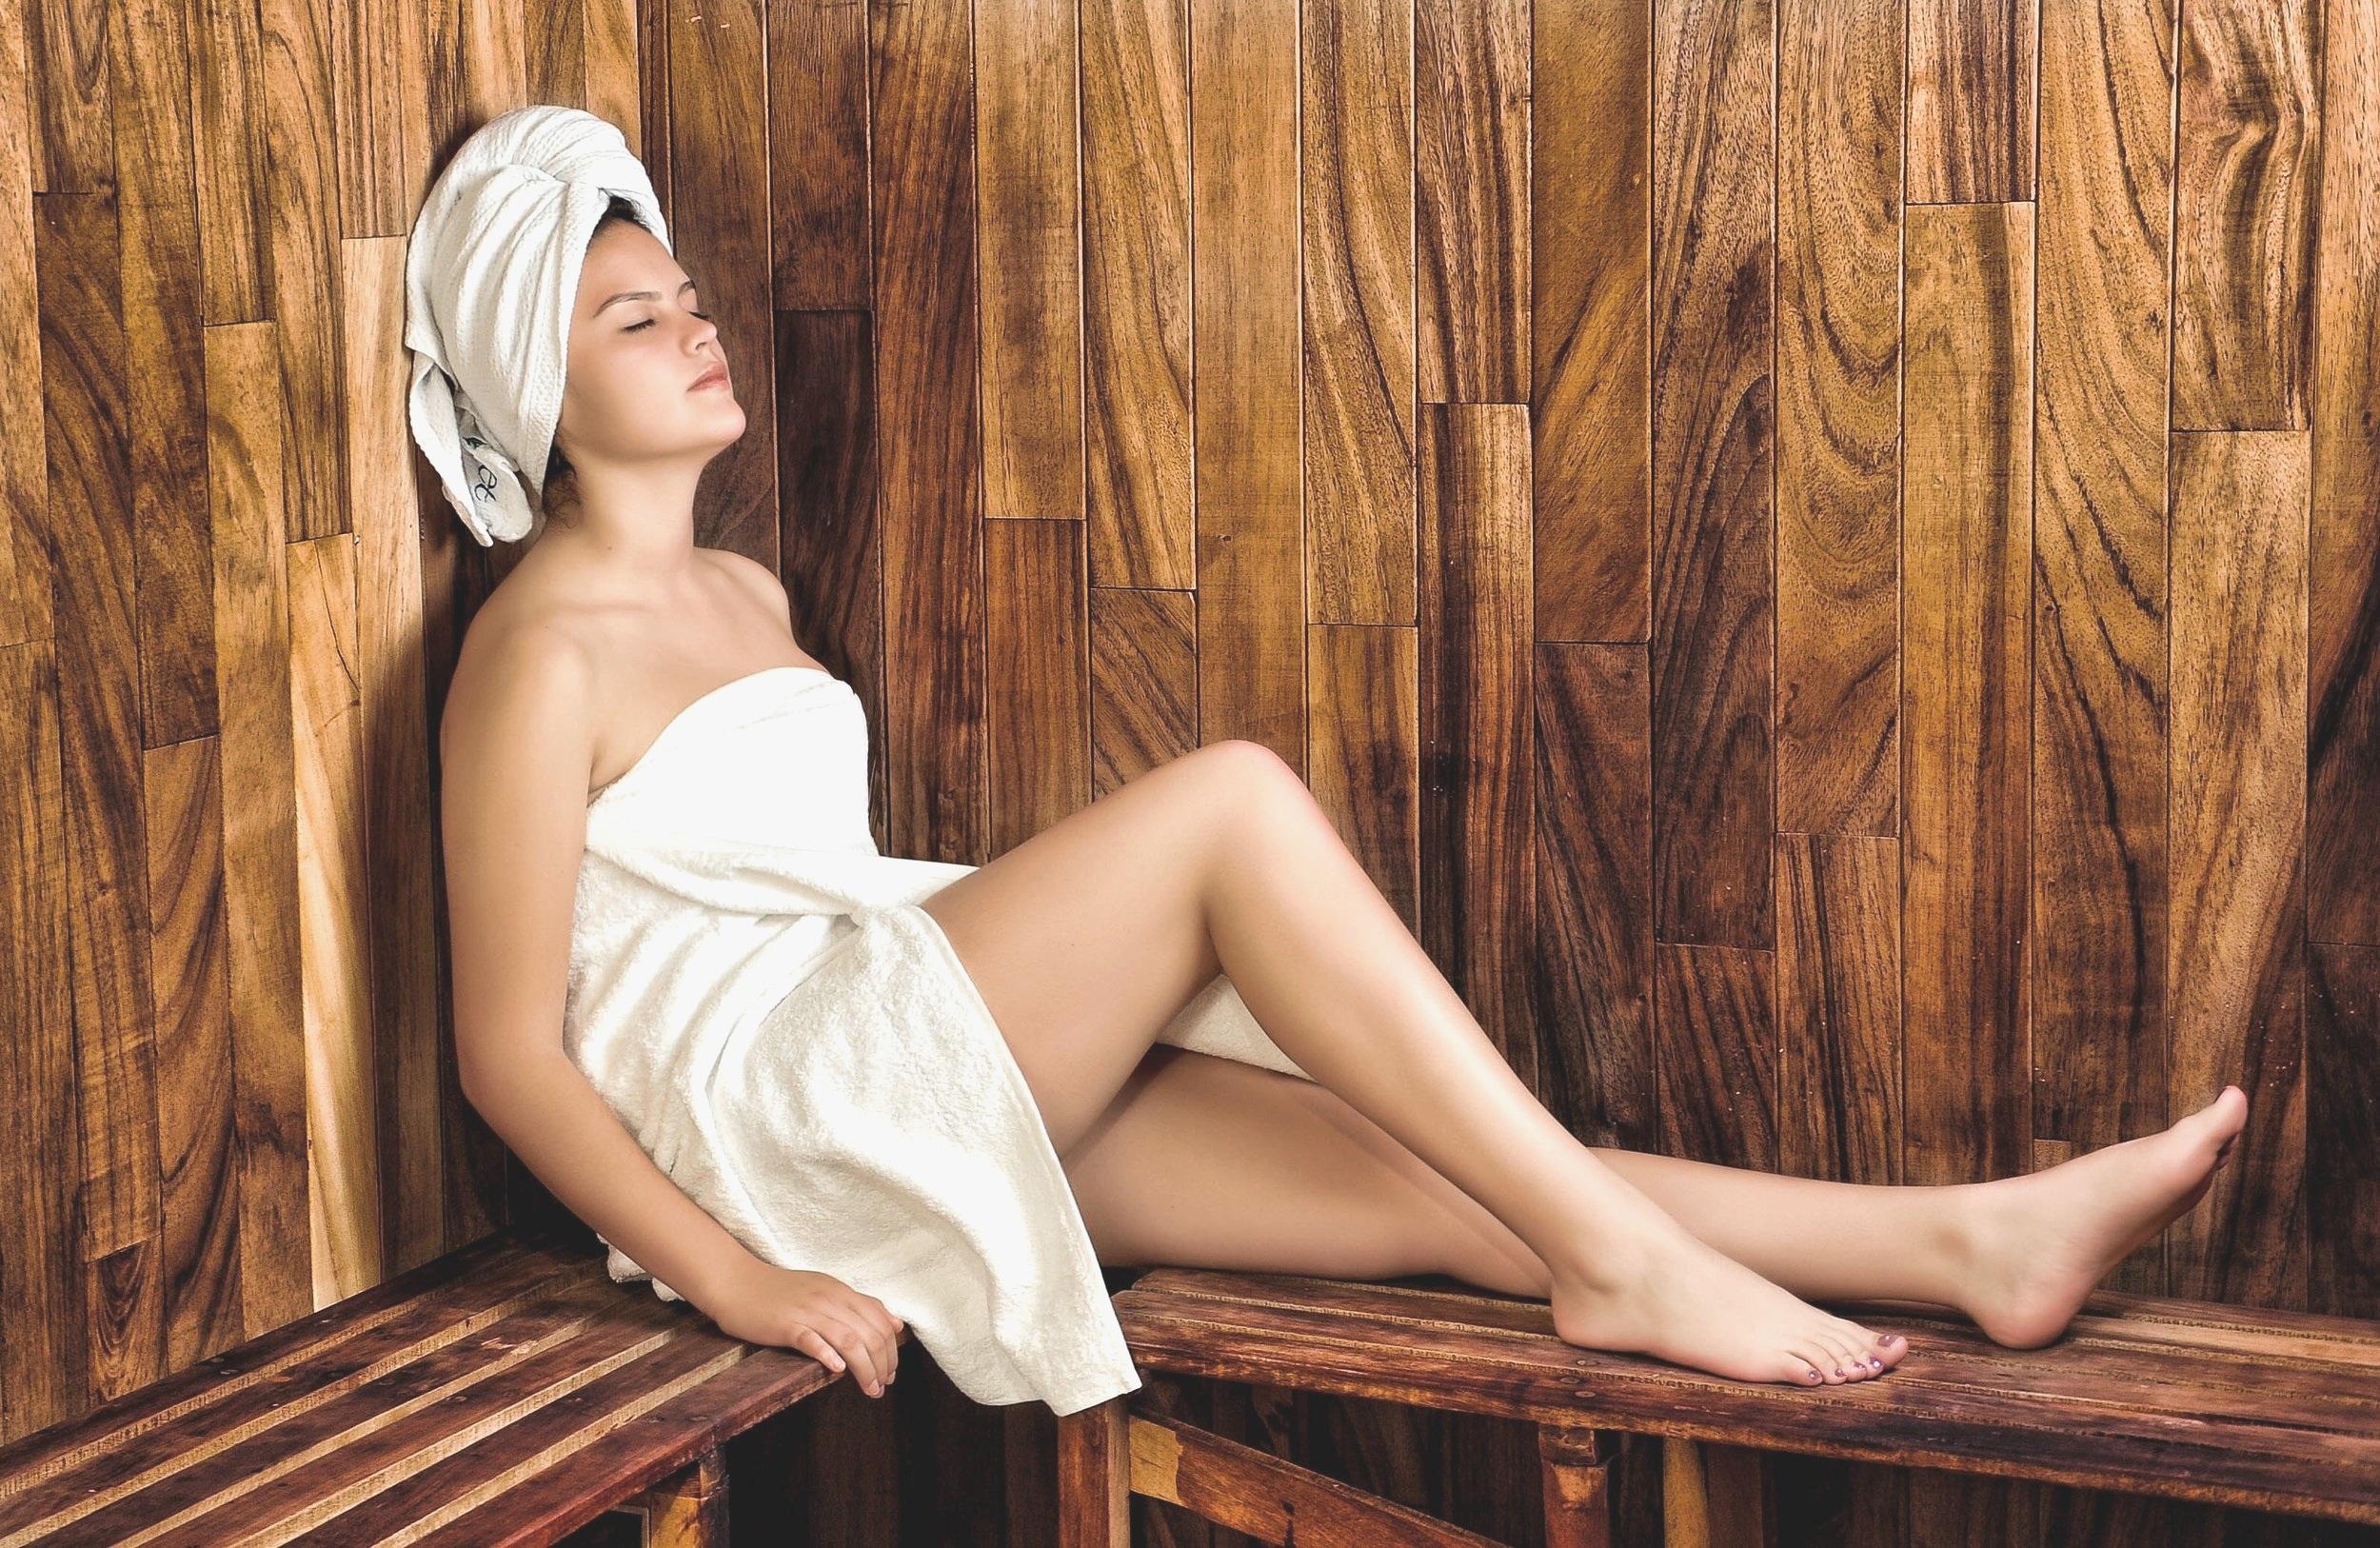 woman in towel in dry sauna room